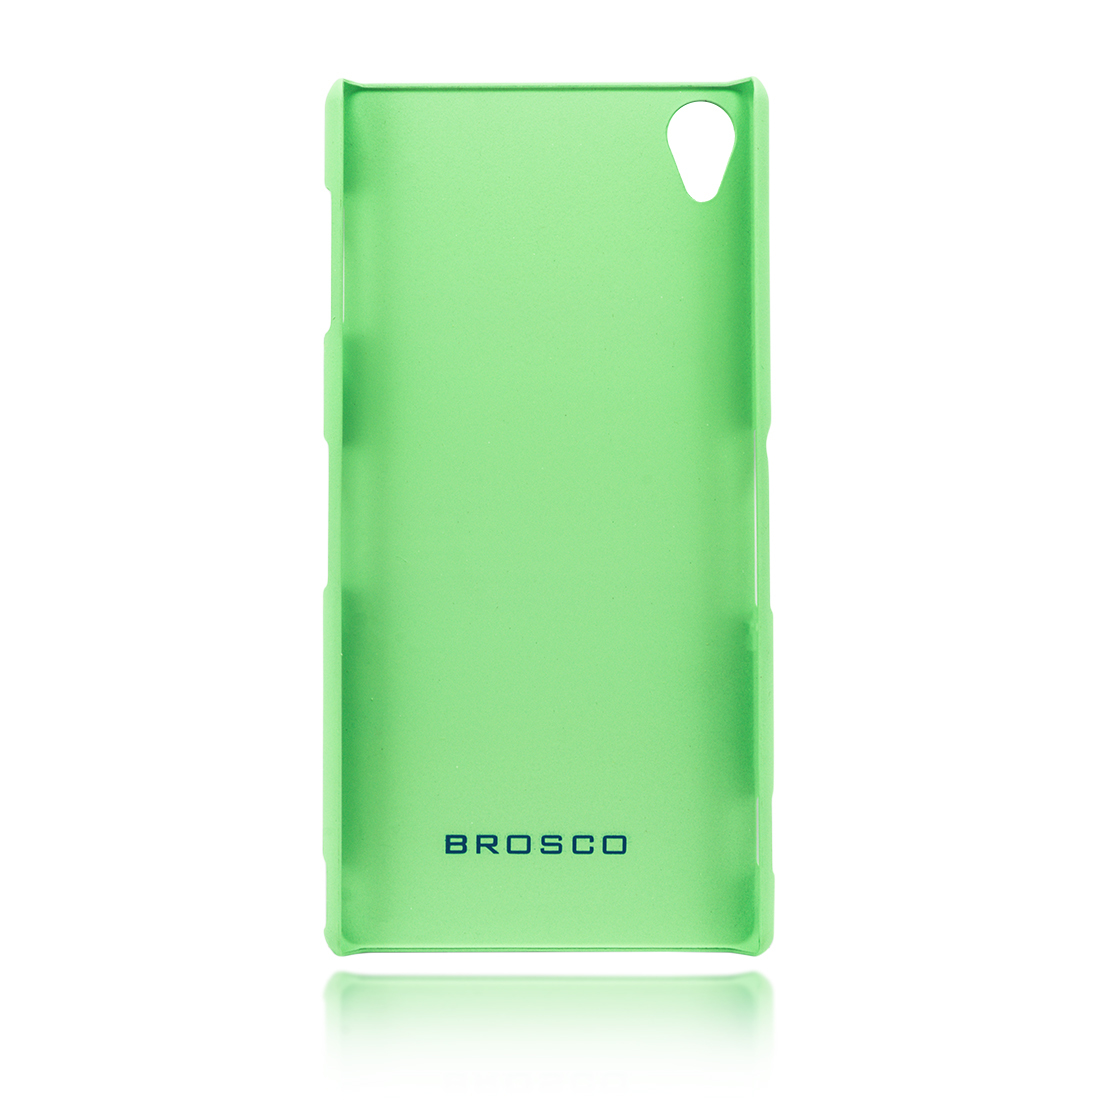 Пластиковая накладка Brosco для Xperia Z3 зелёного цвета в Sony Centre